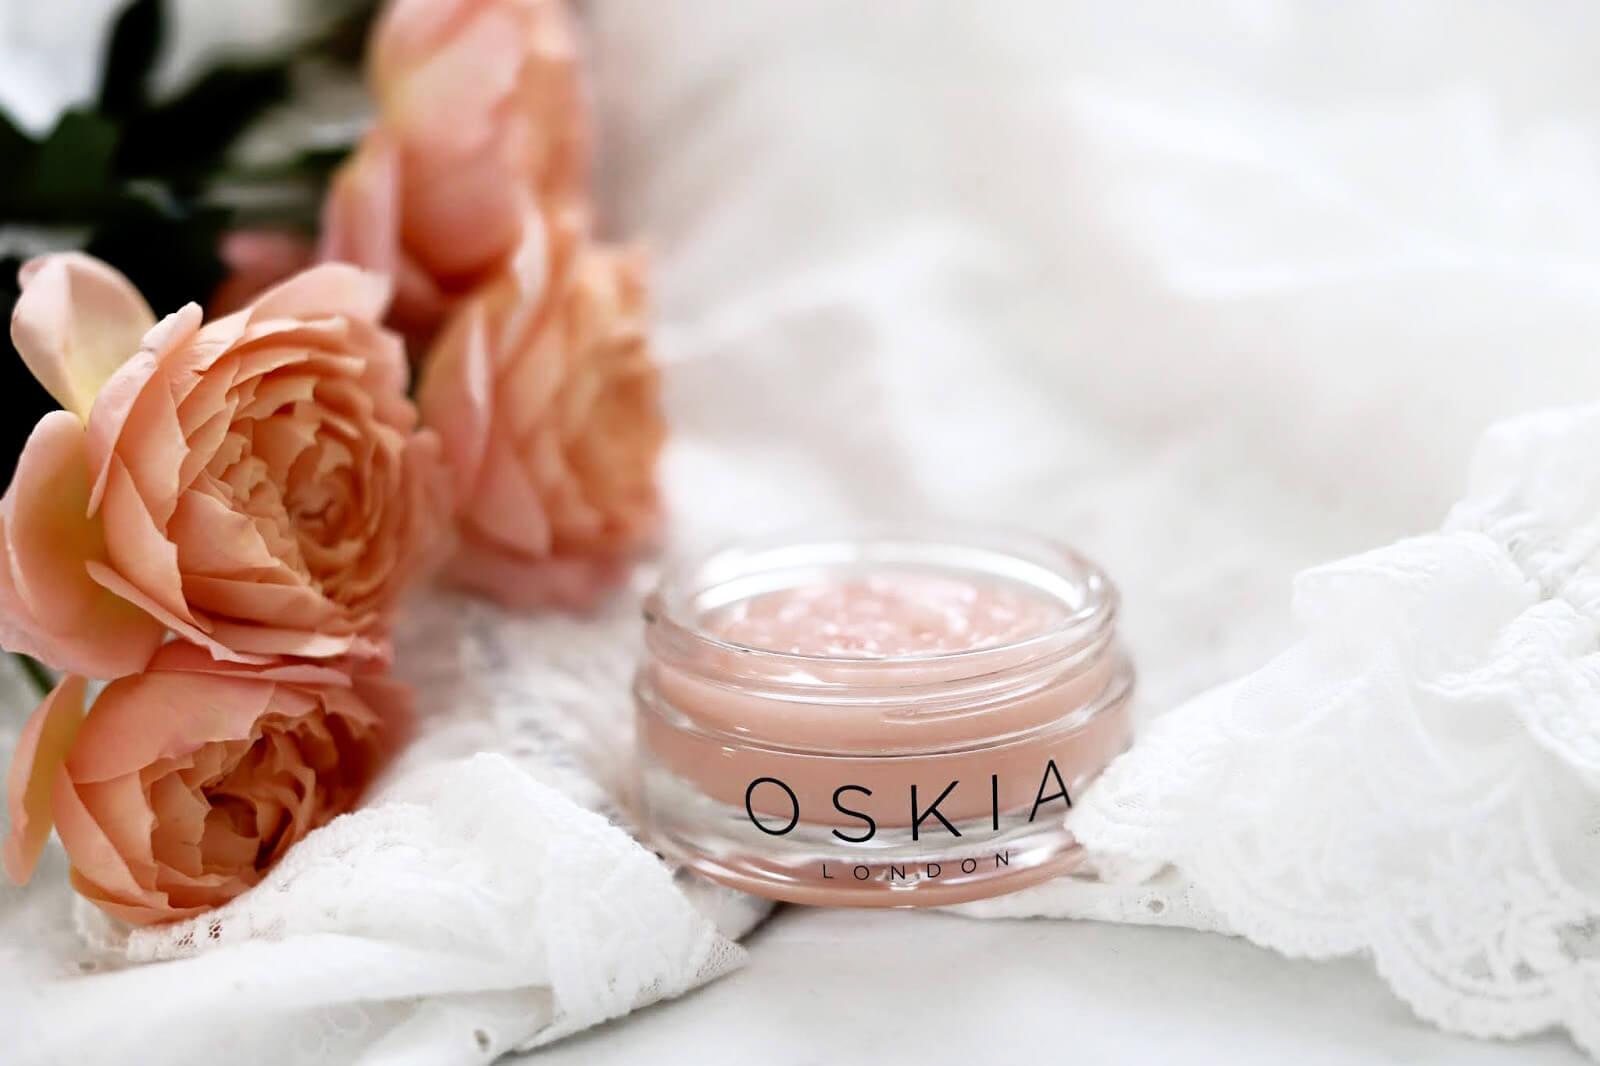 oskia skin care soins visage compositions avis test